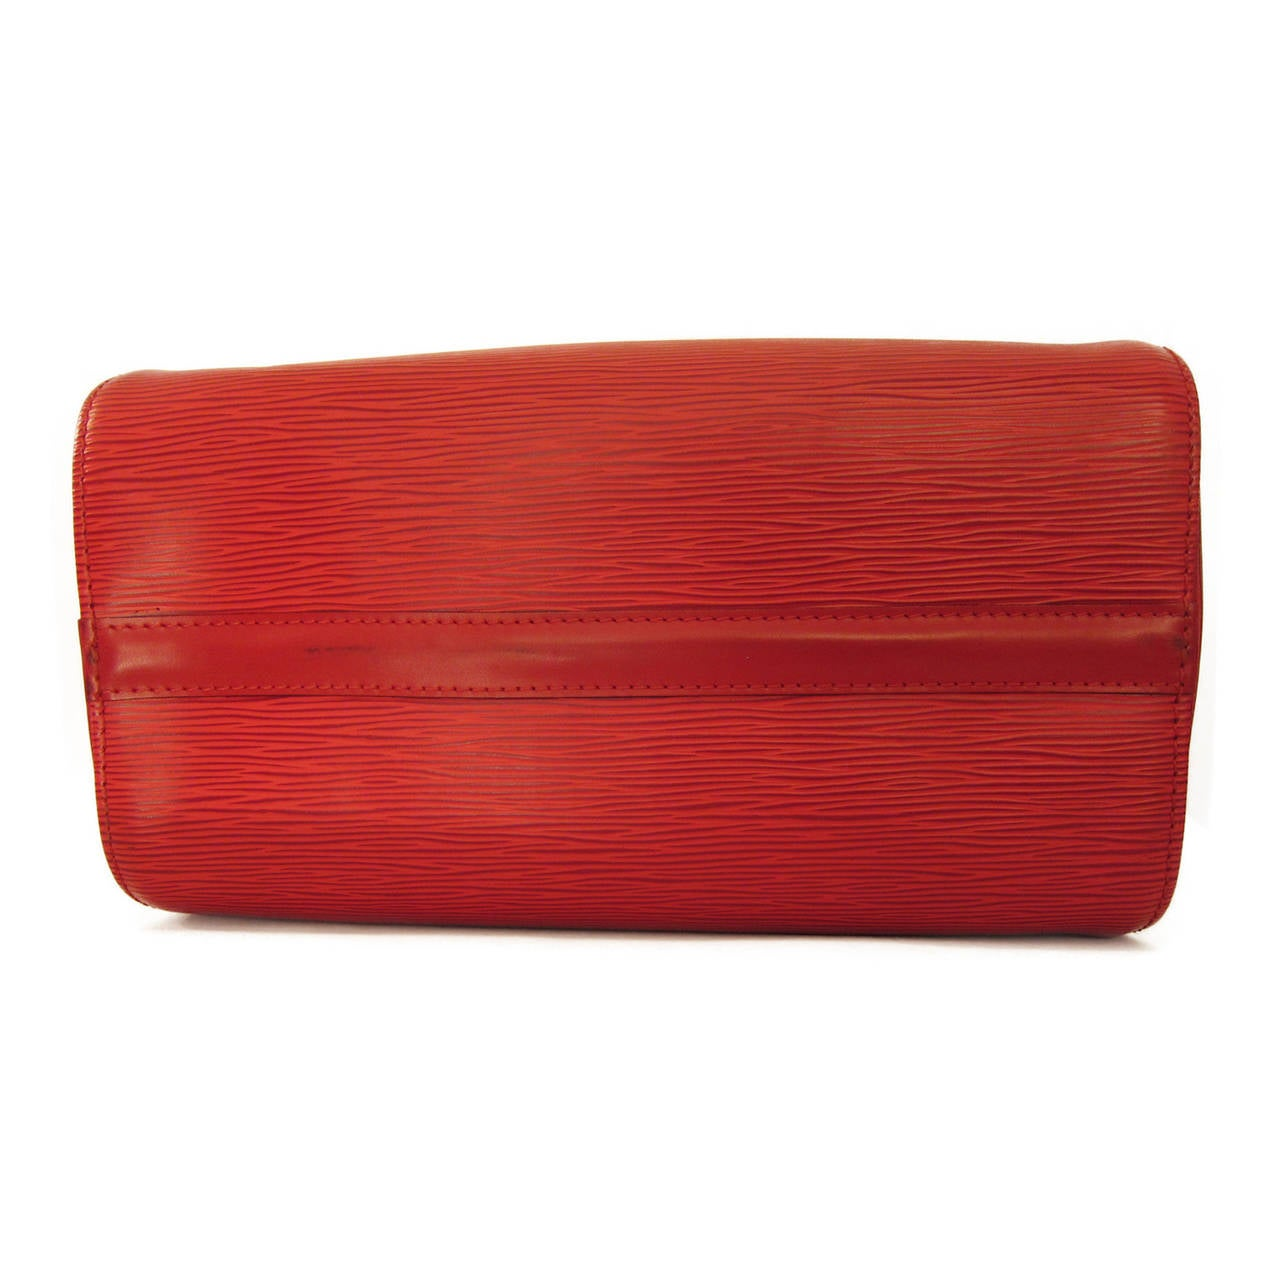 Louis Vuitton Speedy 30 Epi Red For Sale 1